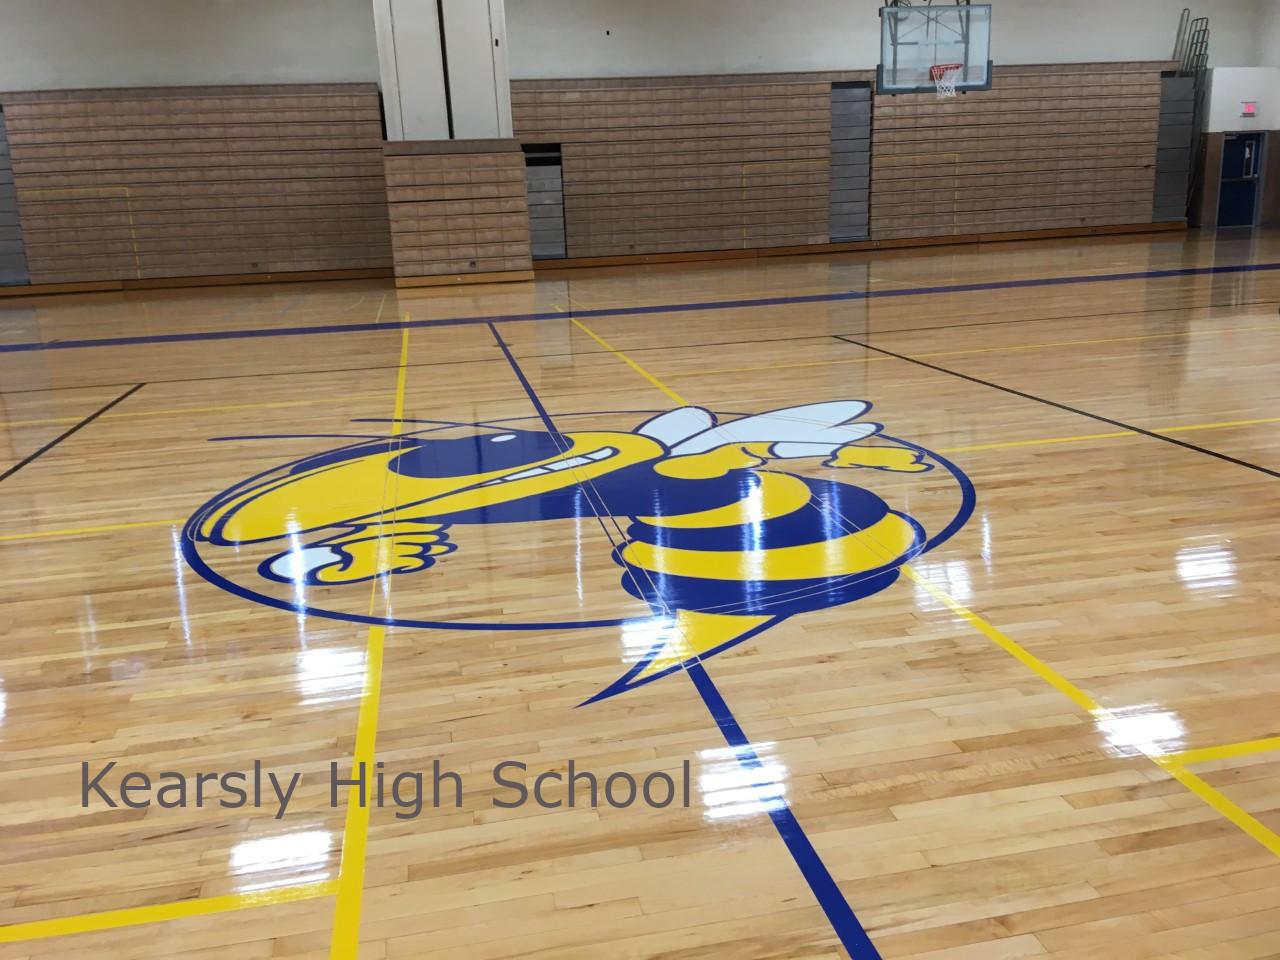 Kearsly High School 2